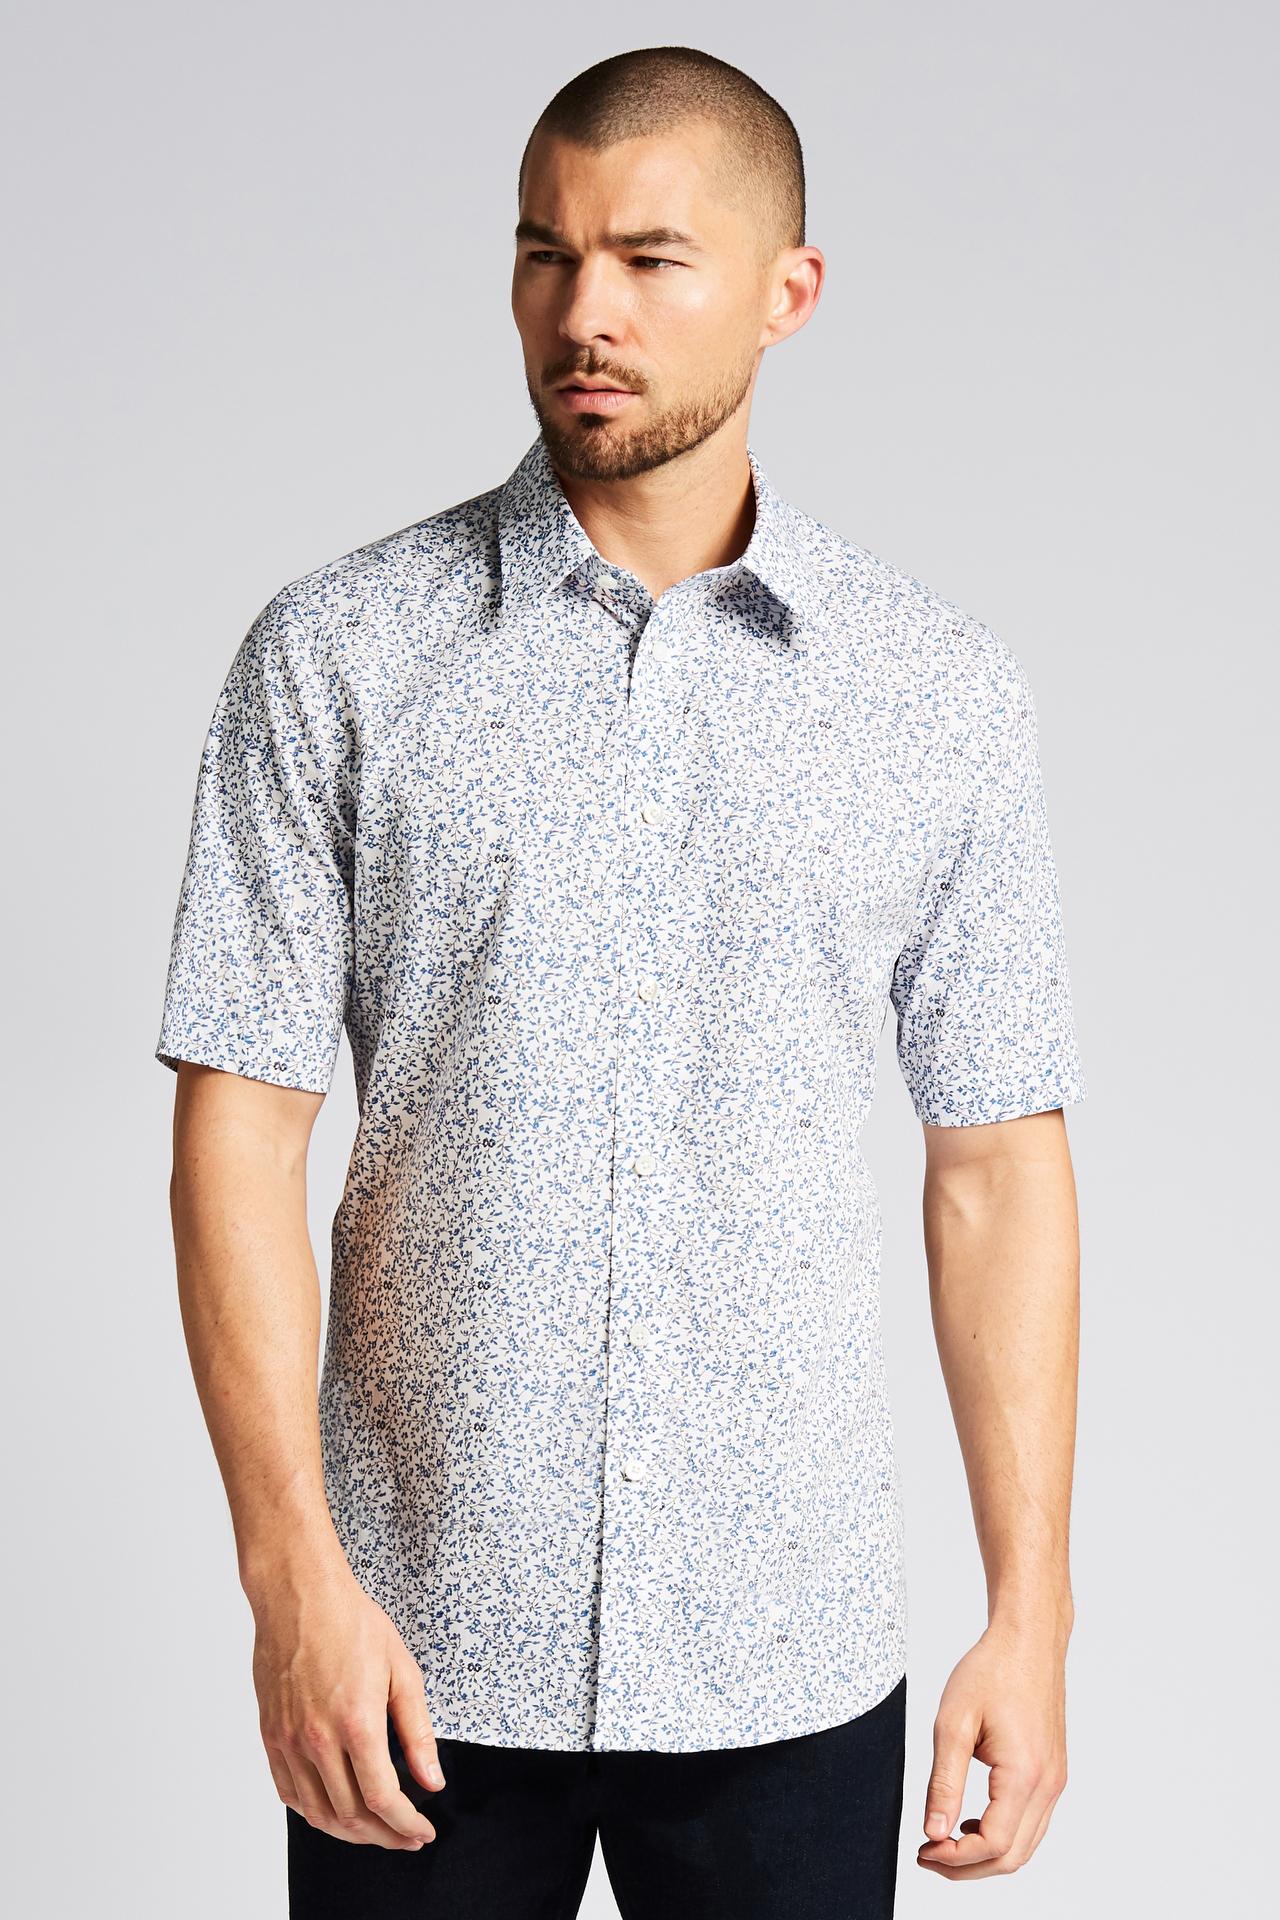 Topanga Blue Vine Short-Sleeve Button-Front Shirt